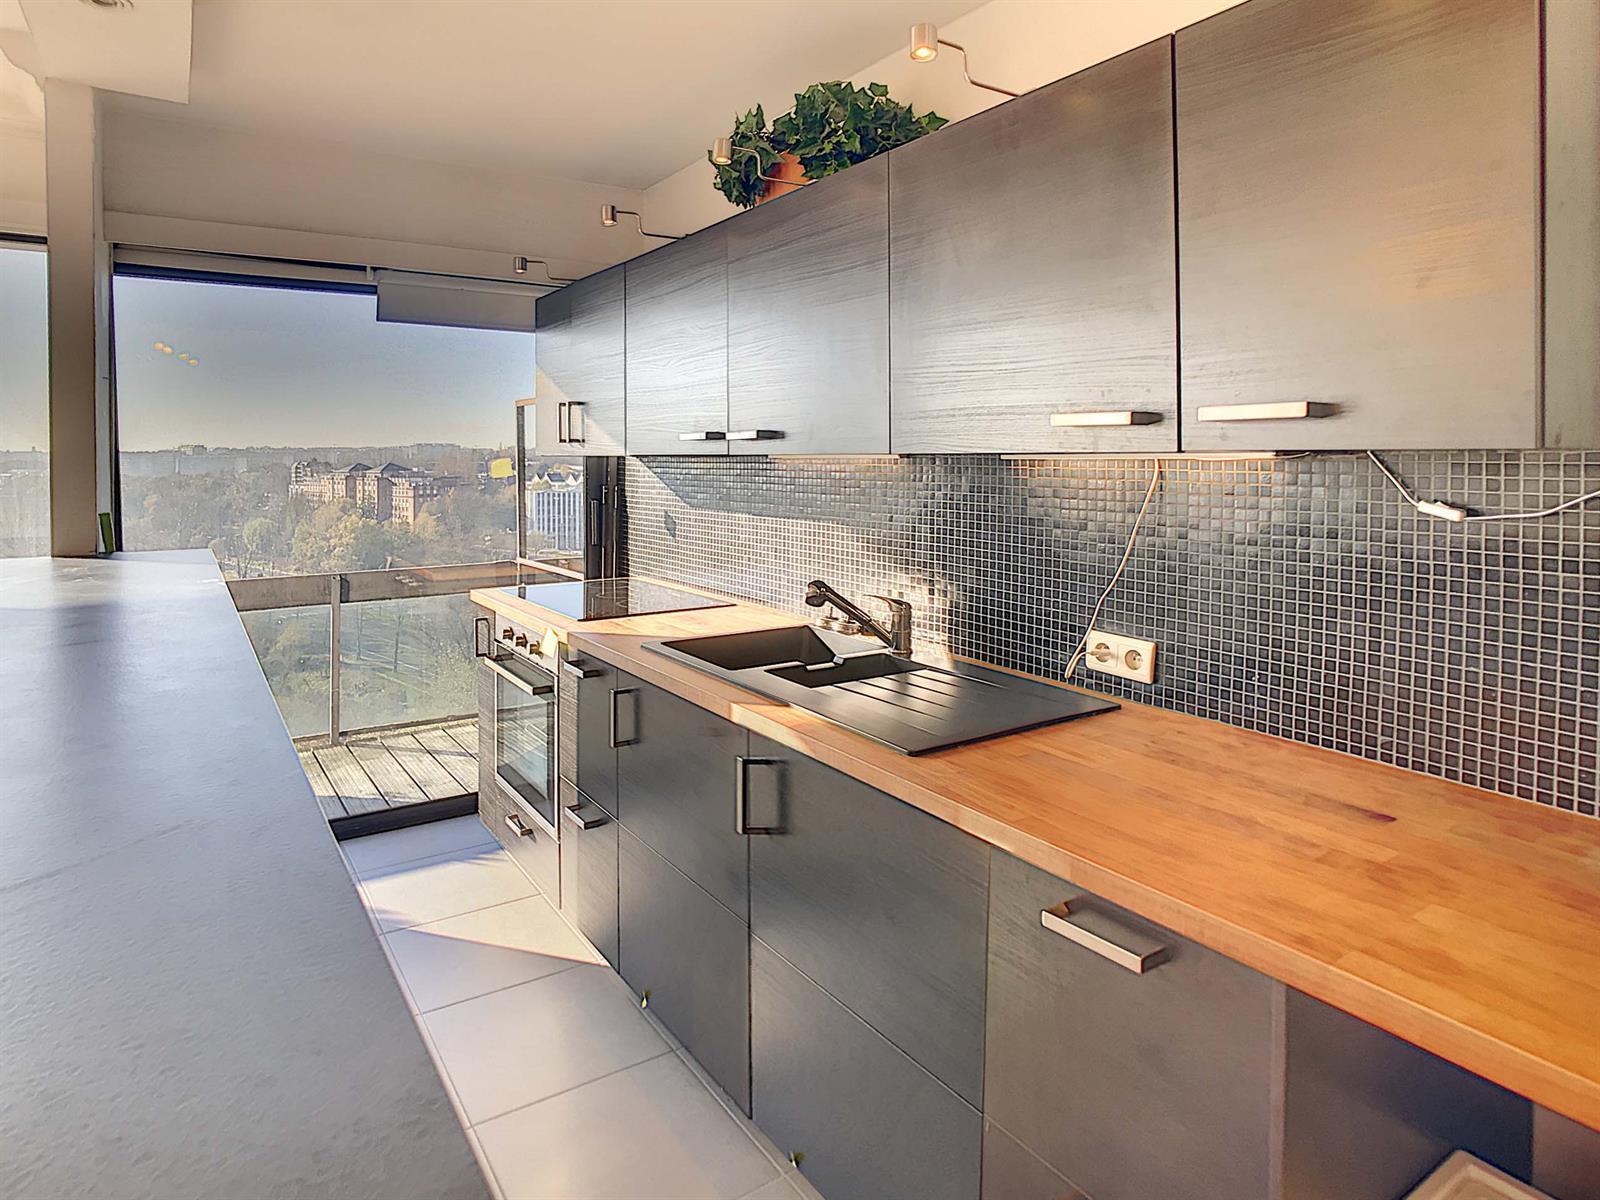 Appartement - Zaventem Sint-Stevens-Woluwe - #4218075-3